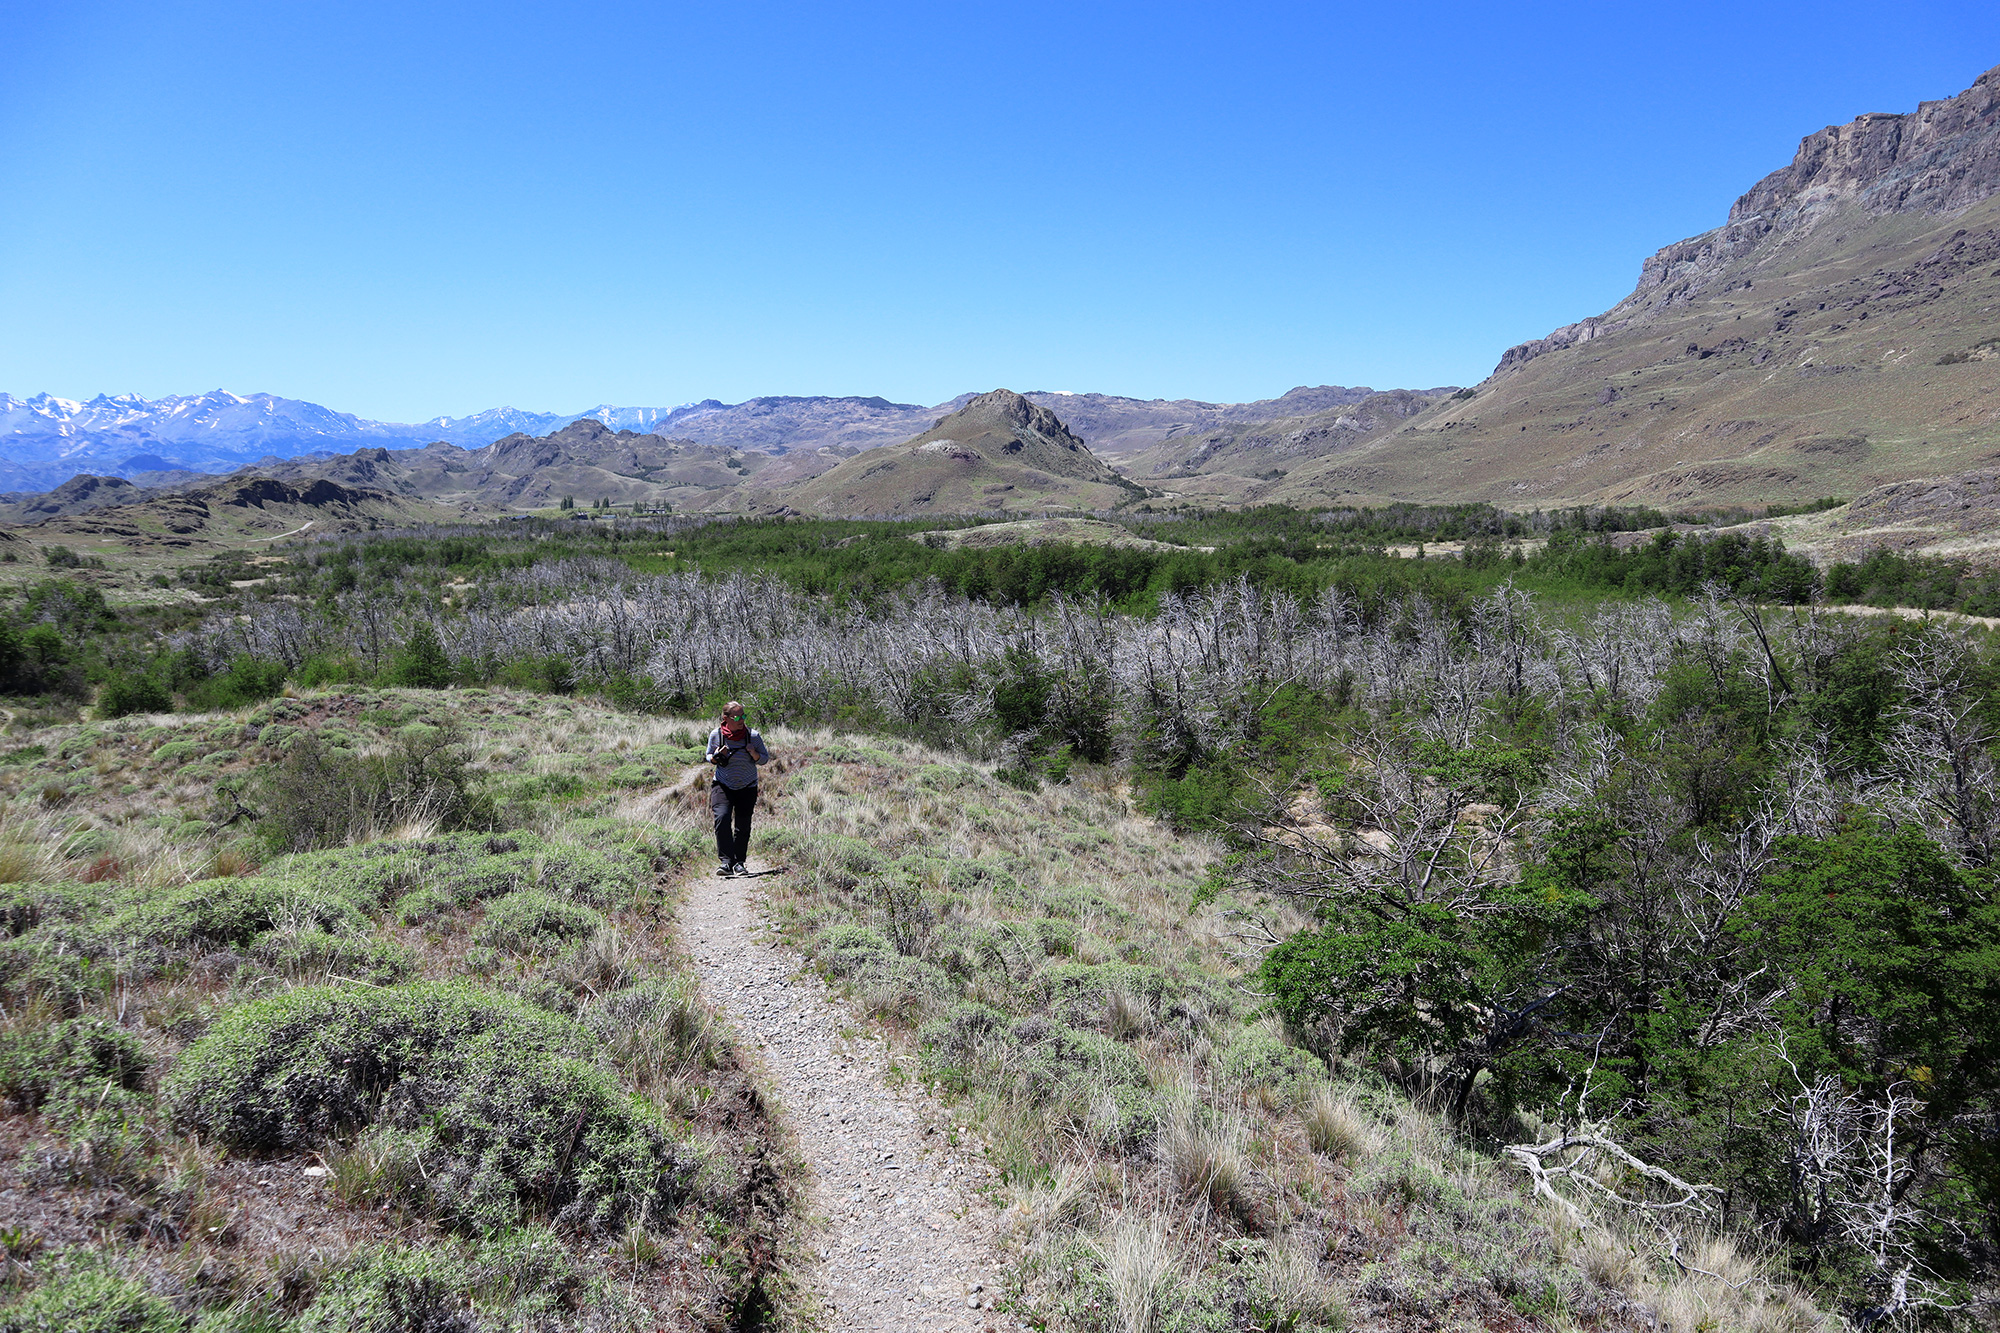 Reisverslag Patagonië - Parque Patagonia - Sendero La Vega